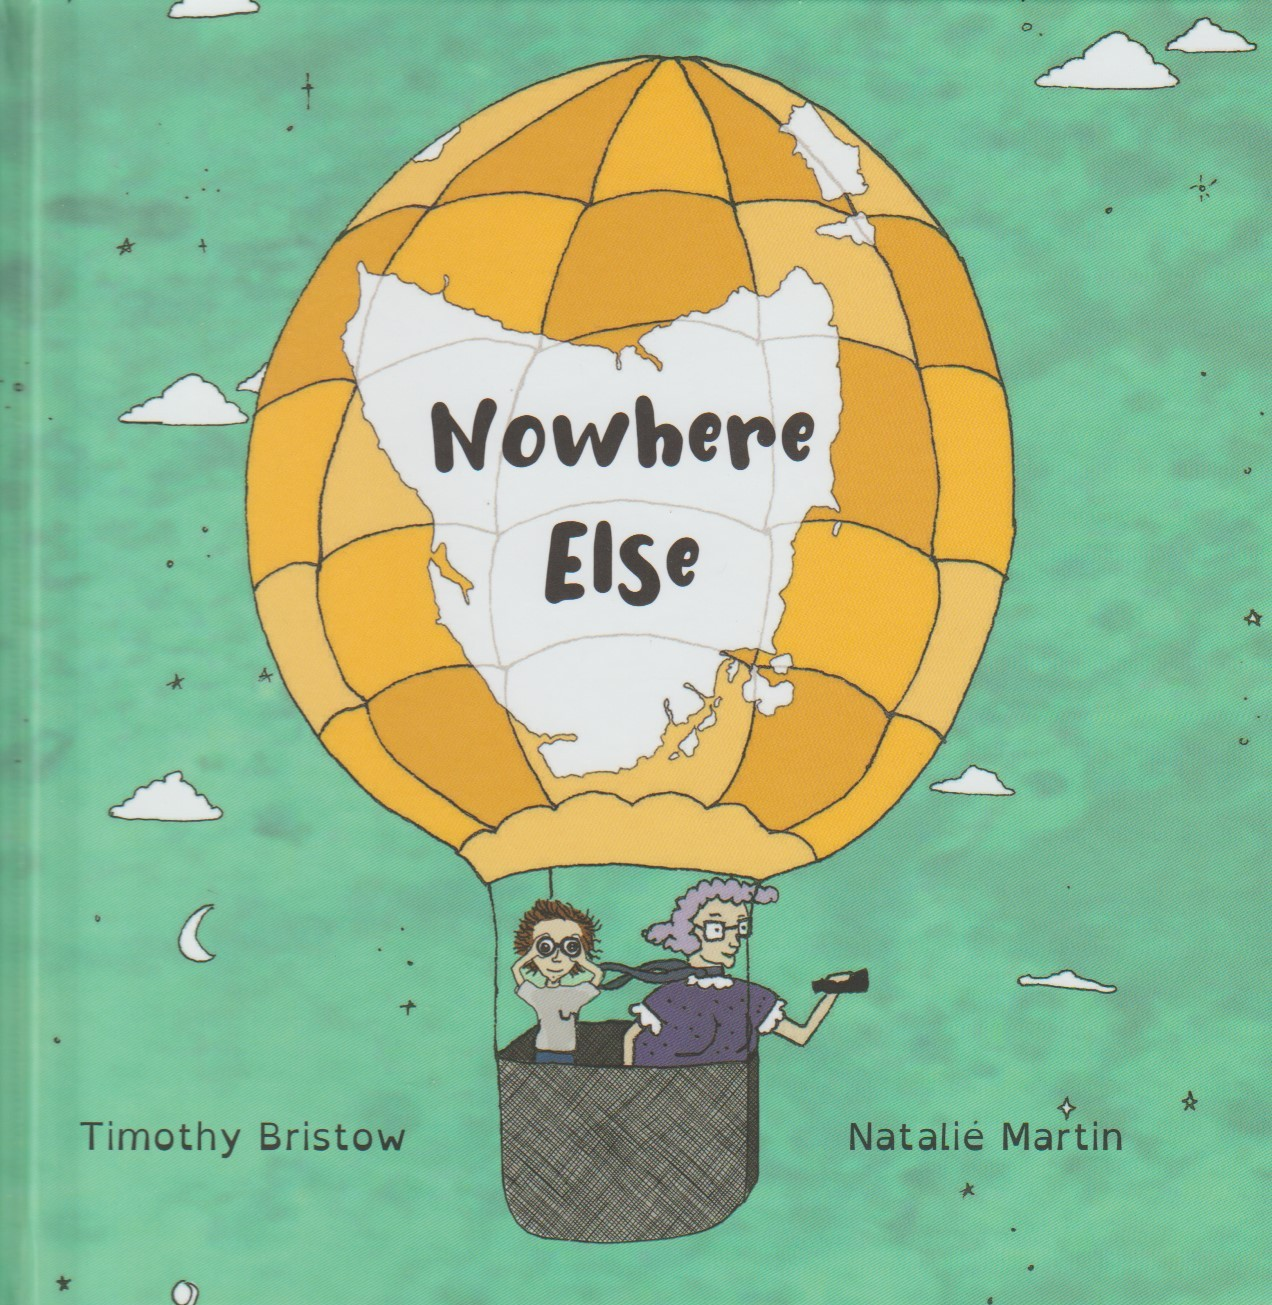 Nowhere Else - a children's book of Tasmania